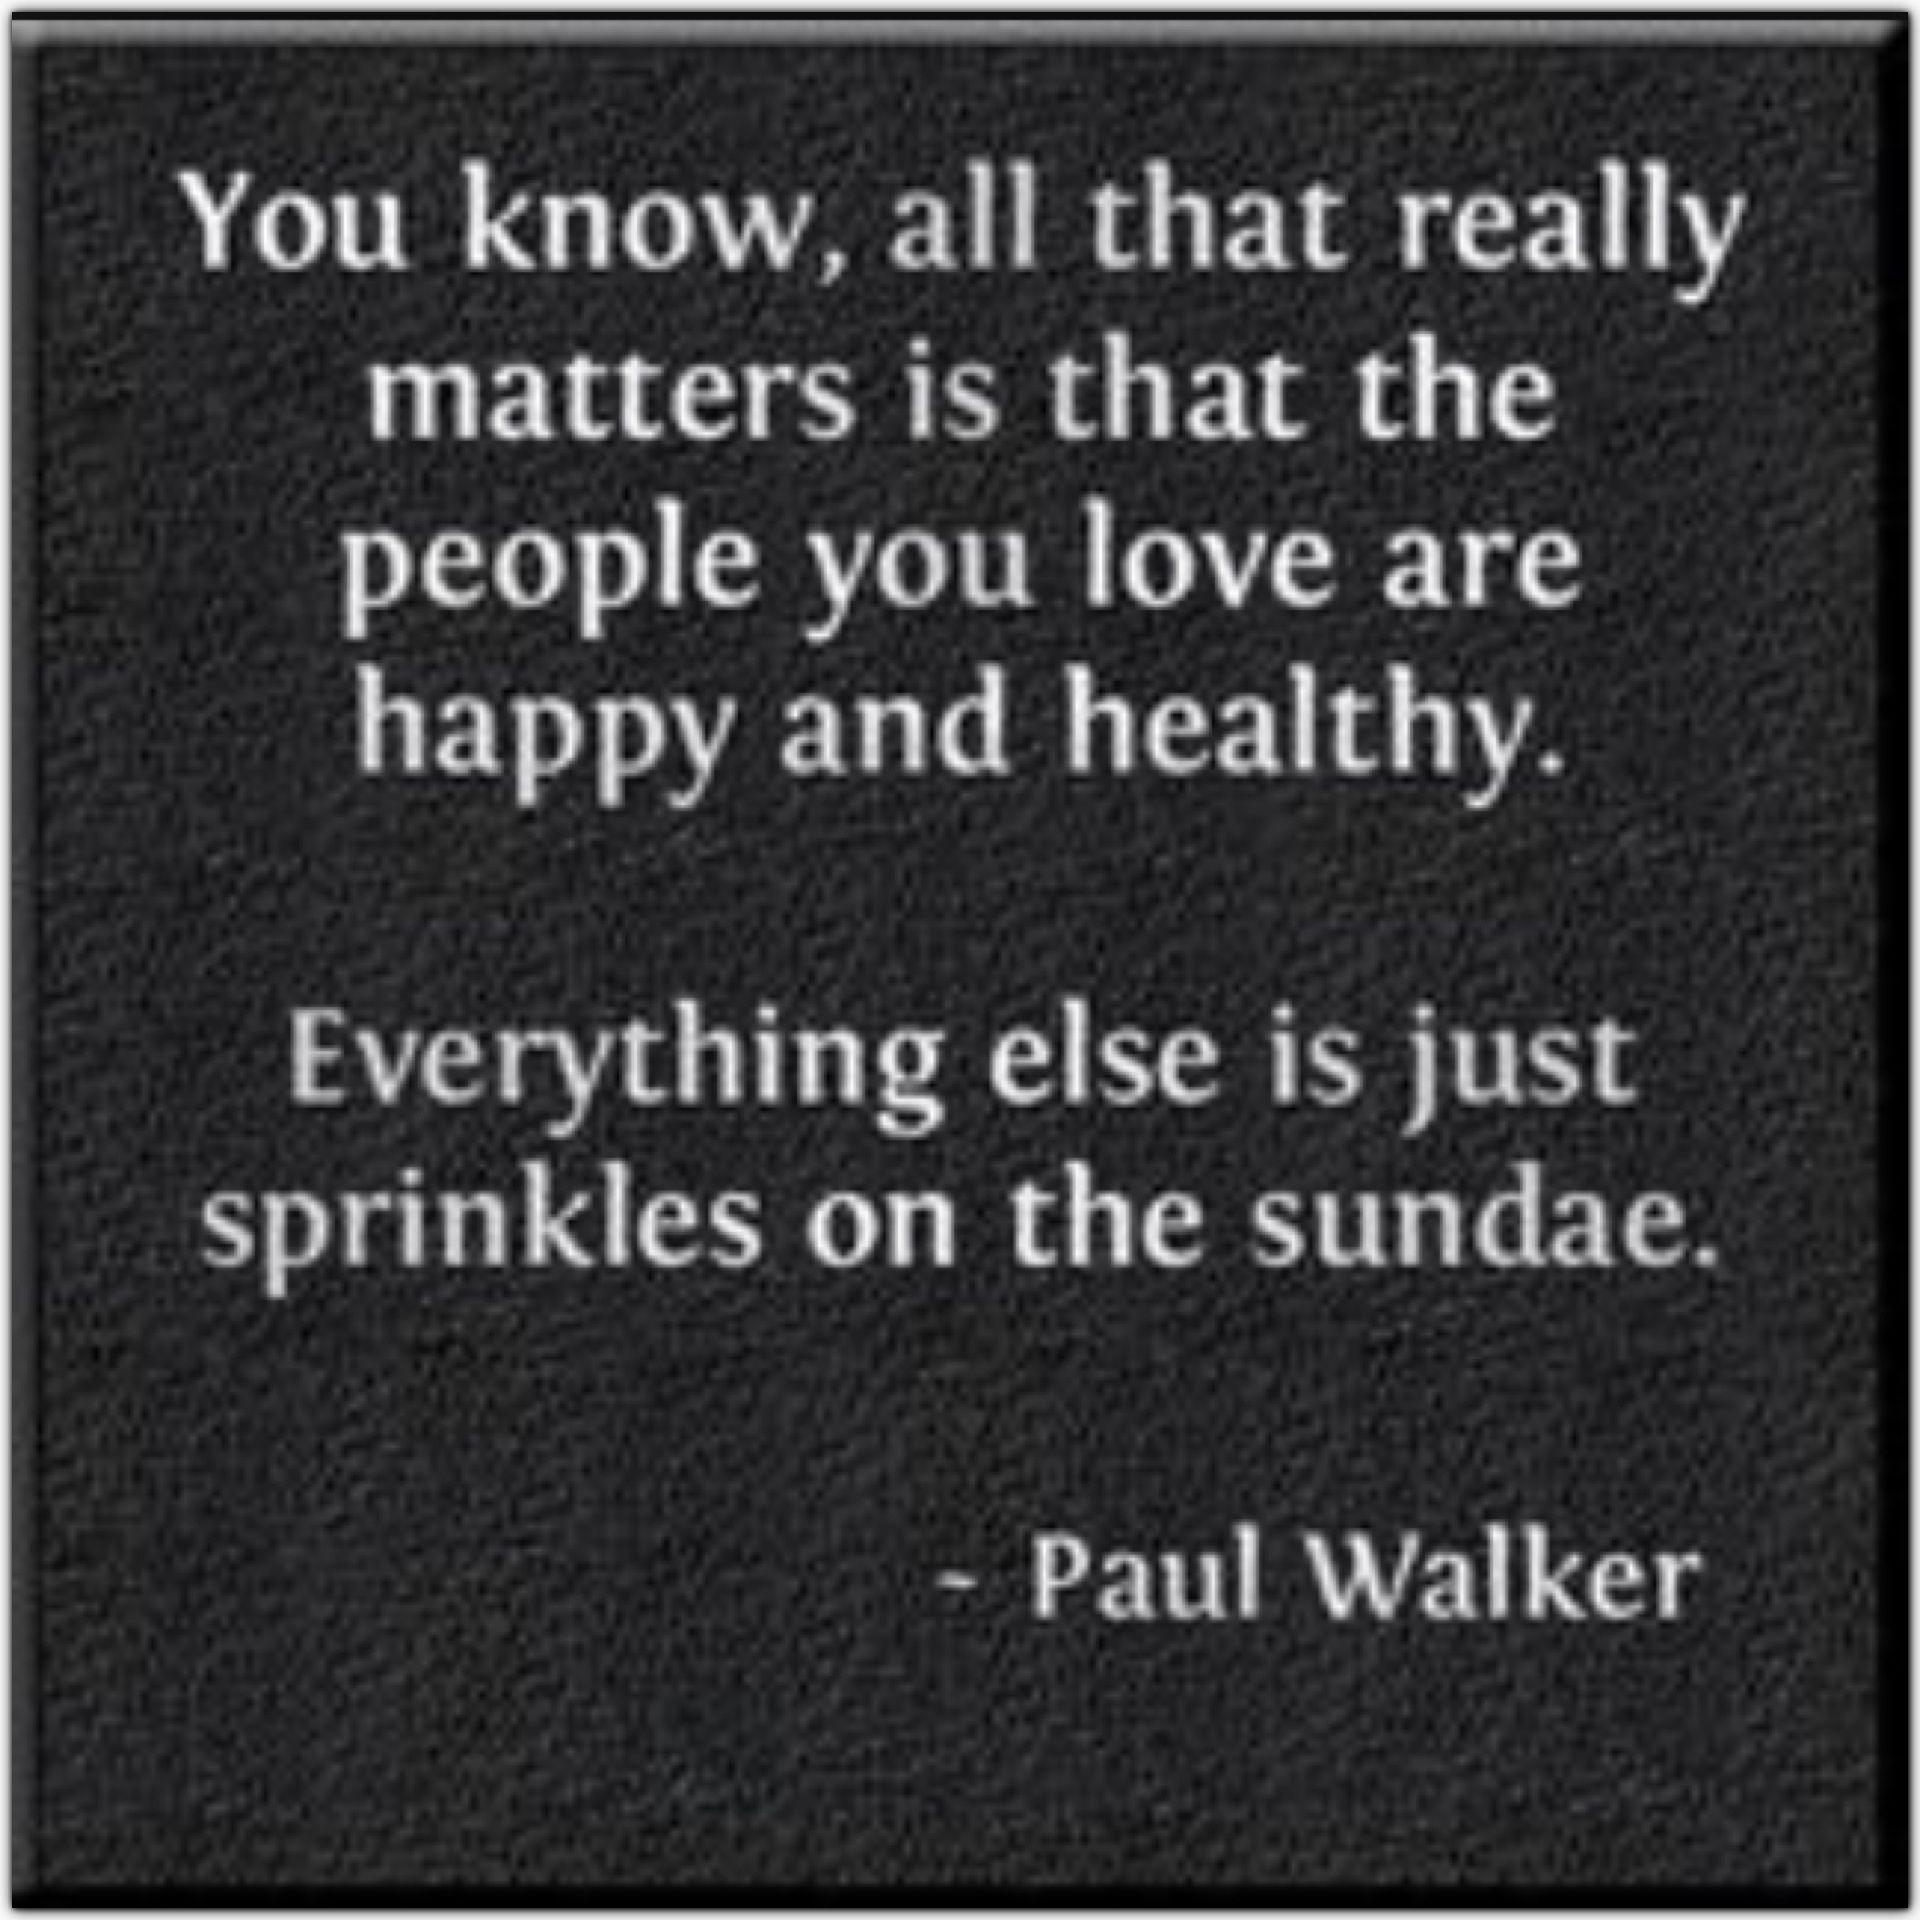 Love health happiness quote Paul Walker